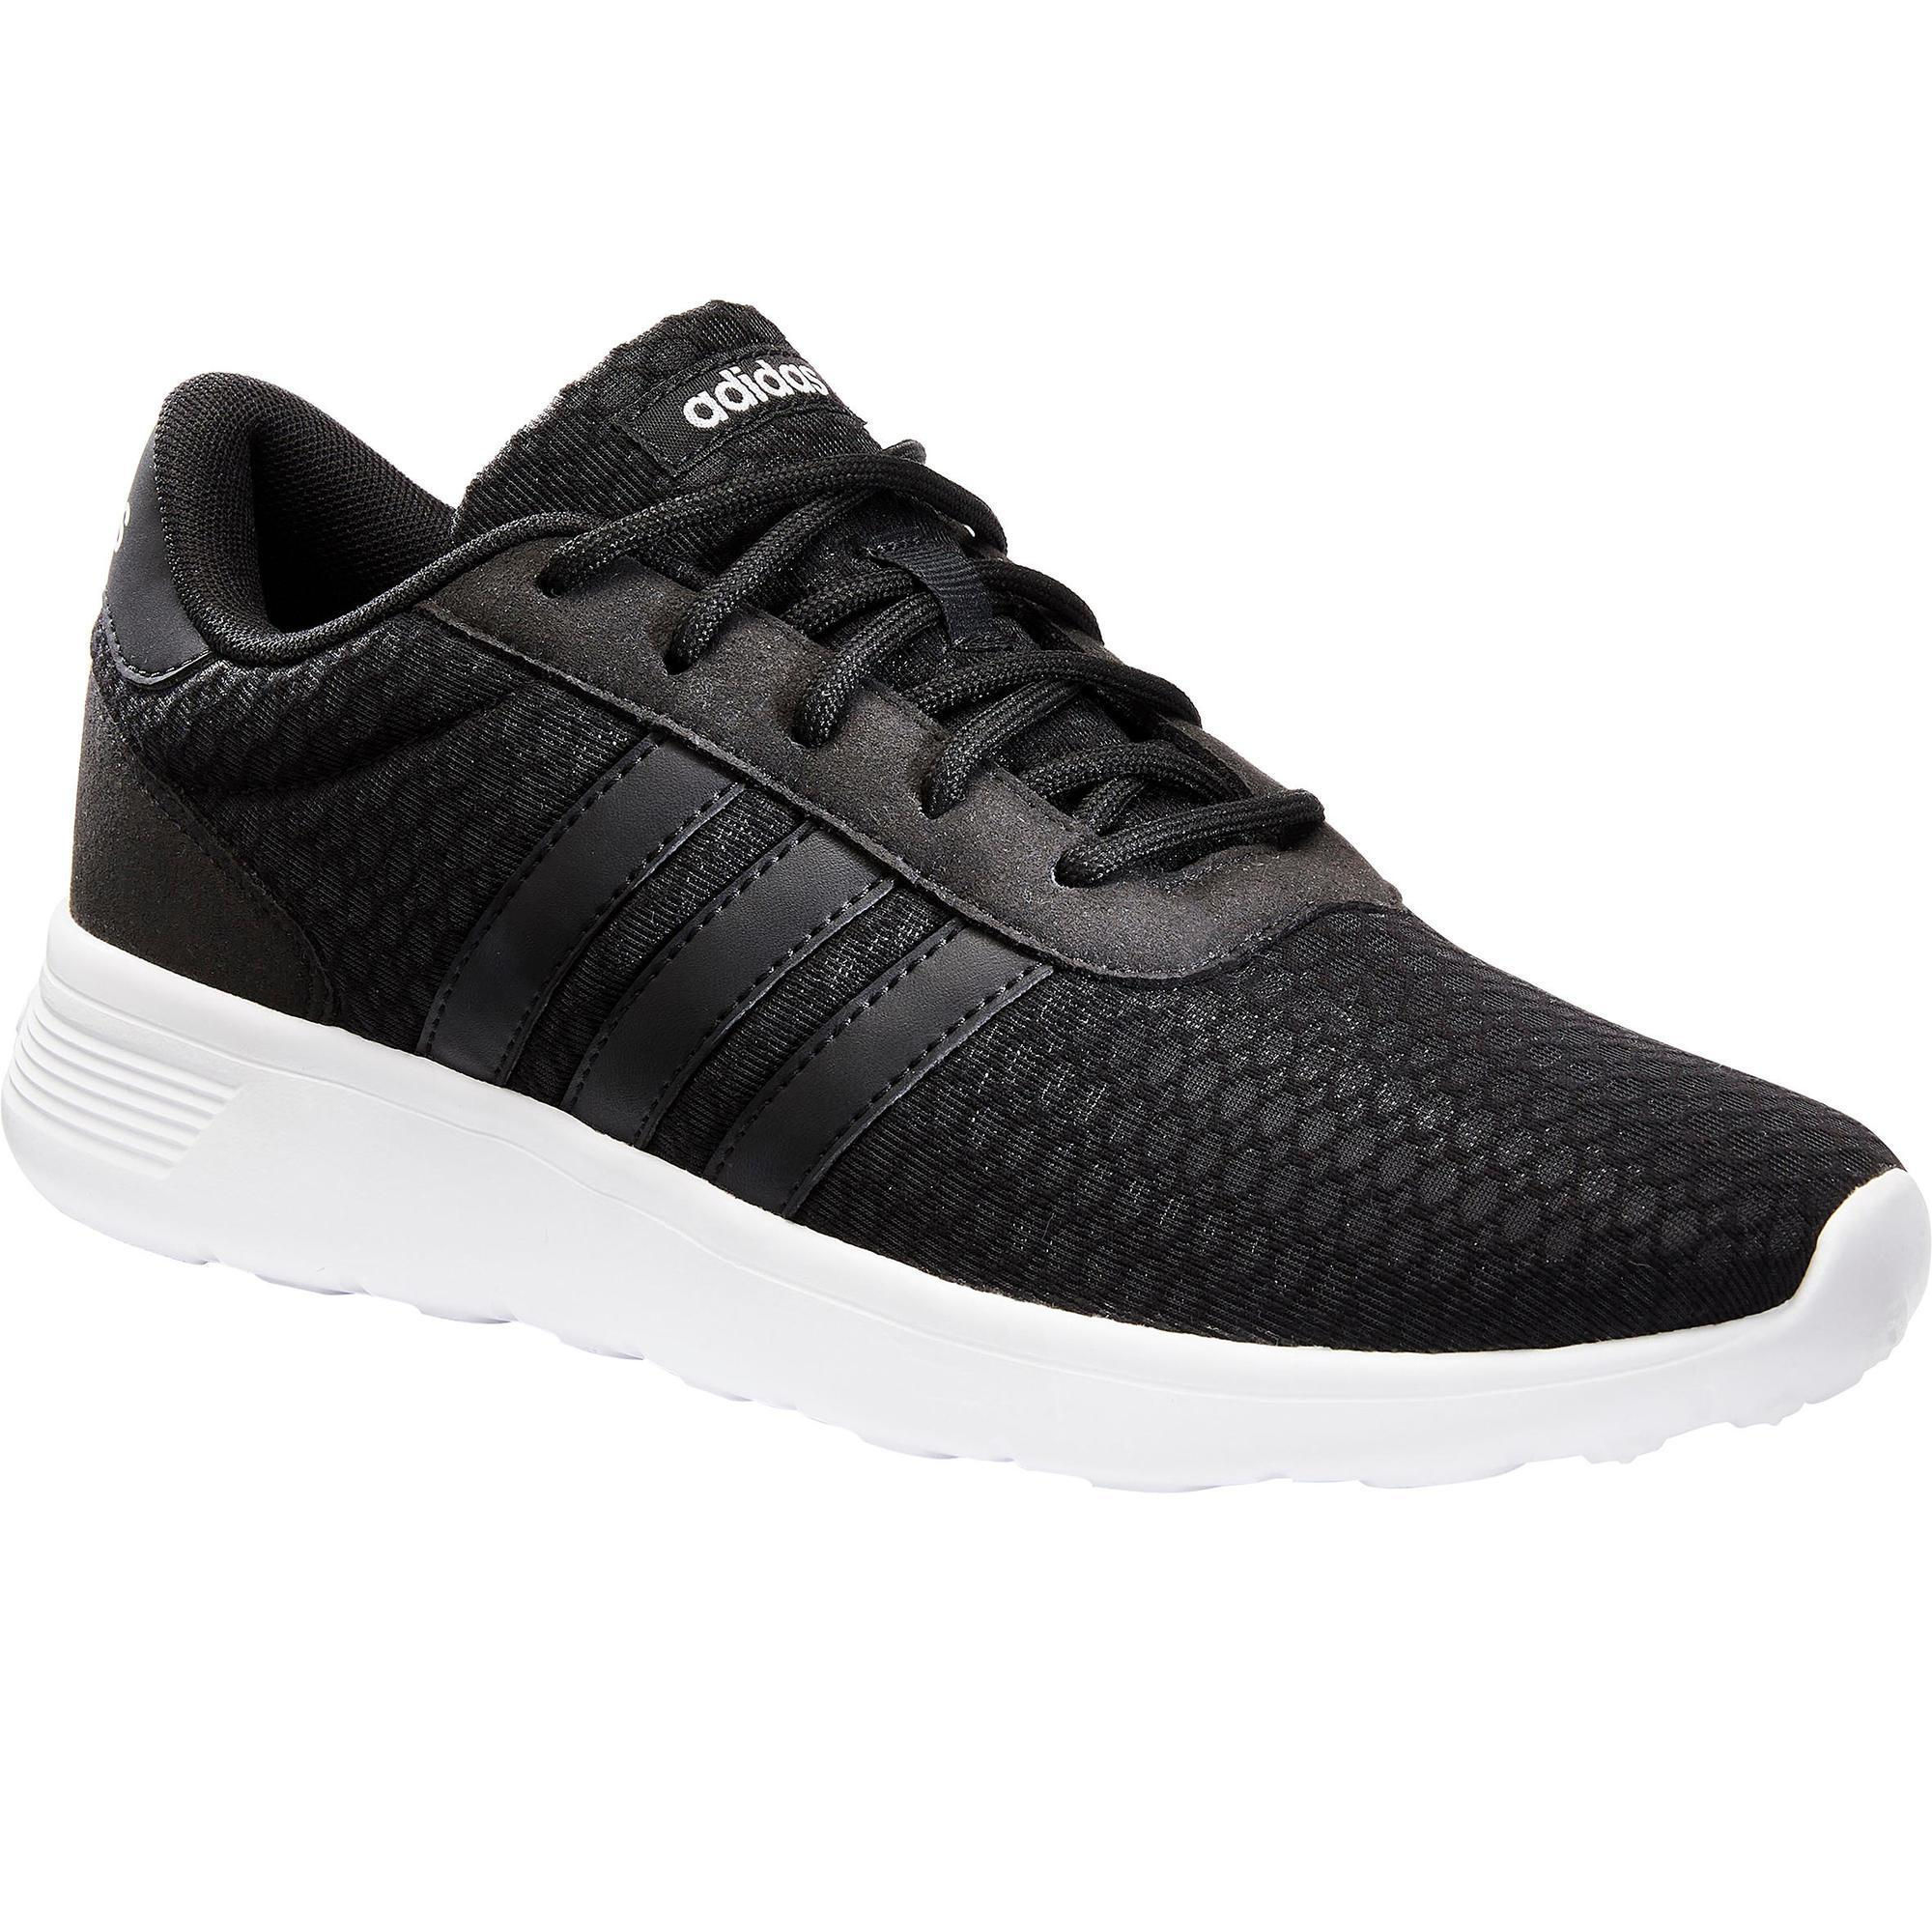 Walkingschuhe Lite Racer Damen schwarz | Schuhe > Sportschuhe > Walkingschuhe | Adidas